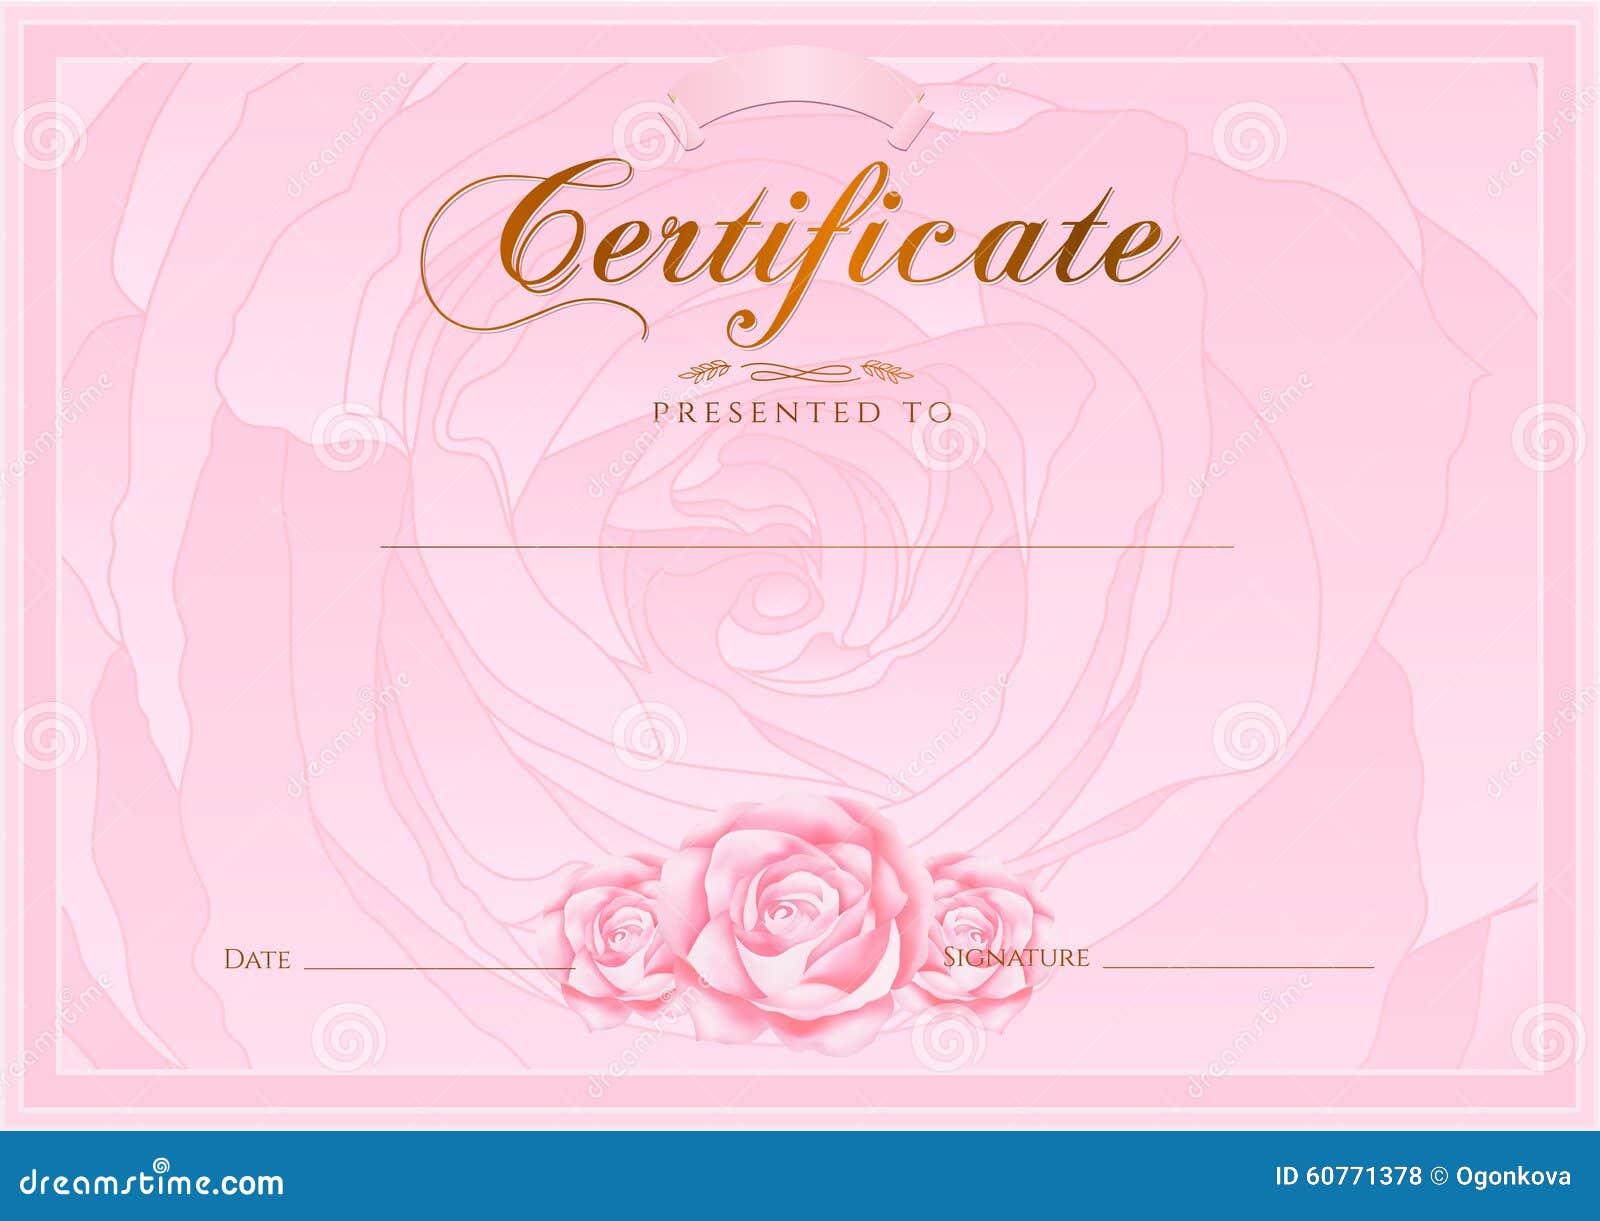 Zertifikat, Diplom Der Fertigstellung (Rosen-Designschablone ...